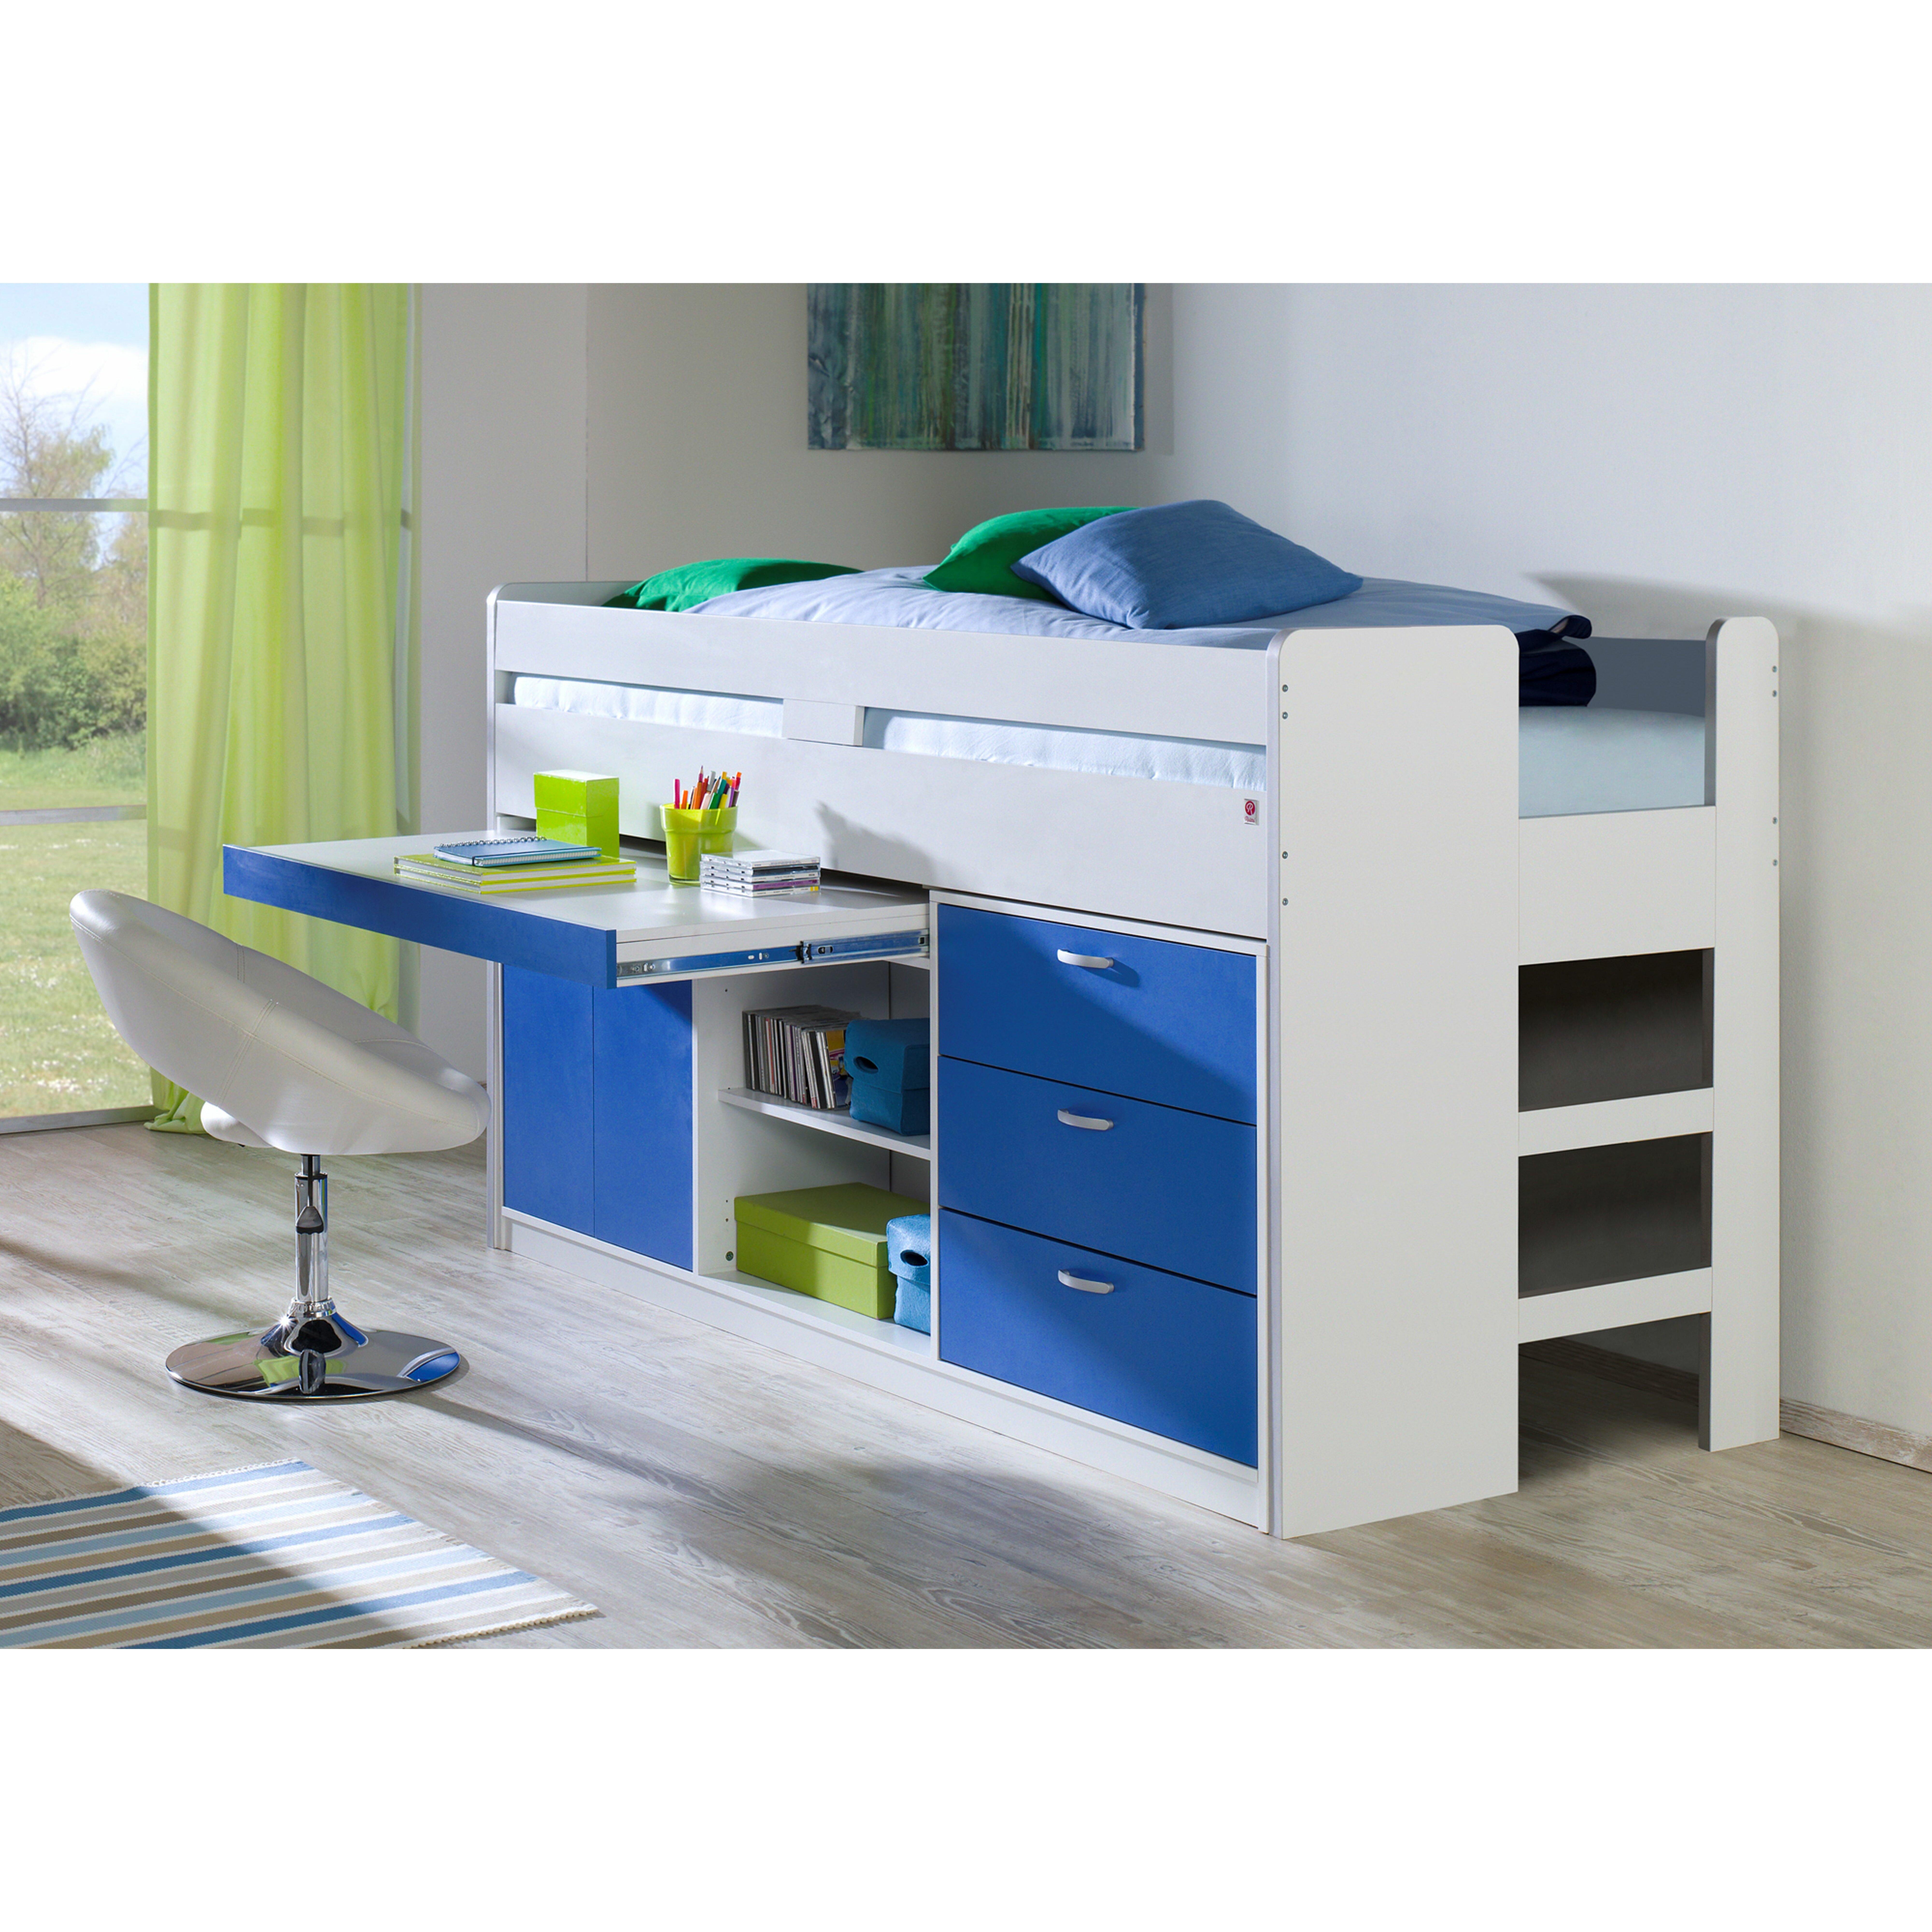 relita hochbett bonny mit schubladen 90 x 200 cm. Black Bedroom Furniture Sets. Home Design Ideas